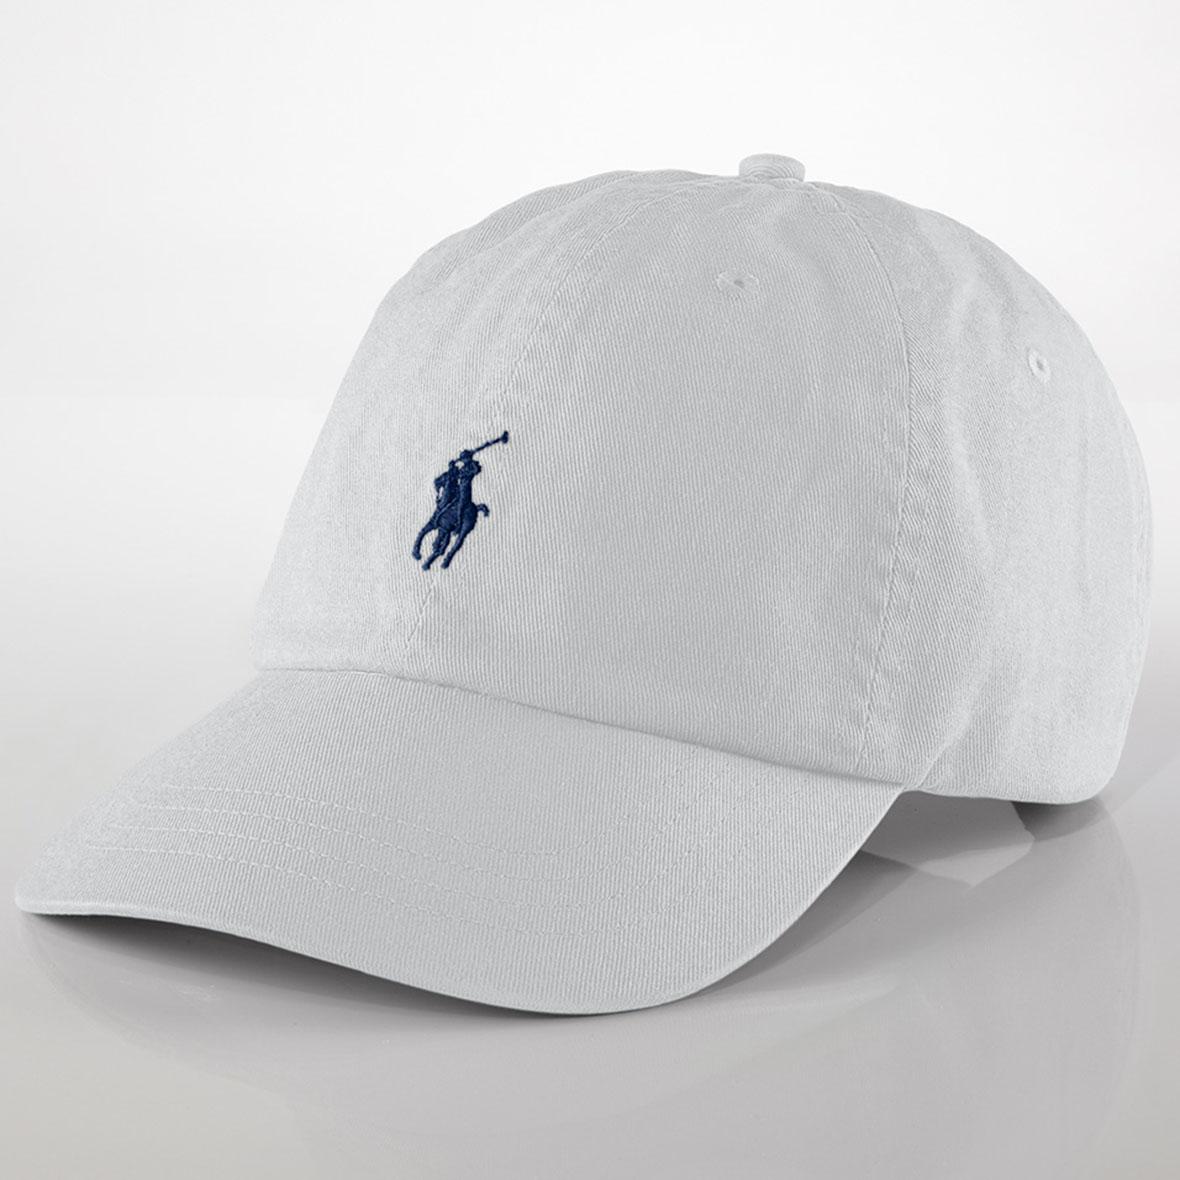 09b71dde96077 Polo Ralph Lauren Men s Signature Pony Hat